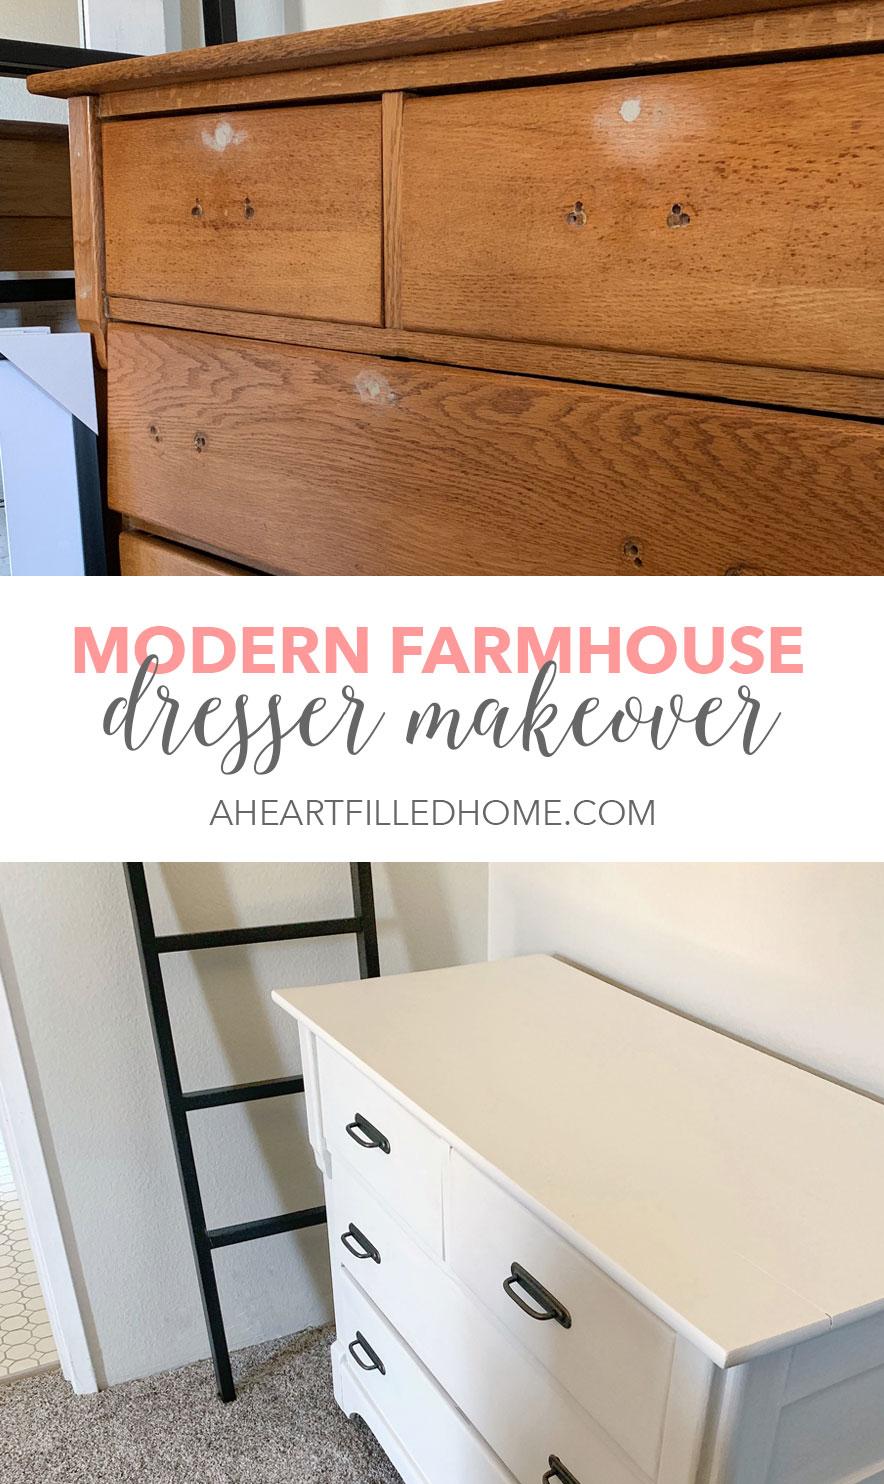 Modern Farmhouse Dresser Makeover A Heart Filled Home Diy Home Decor